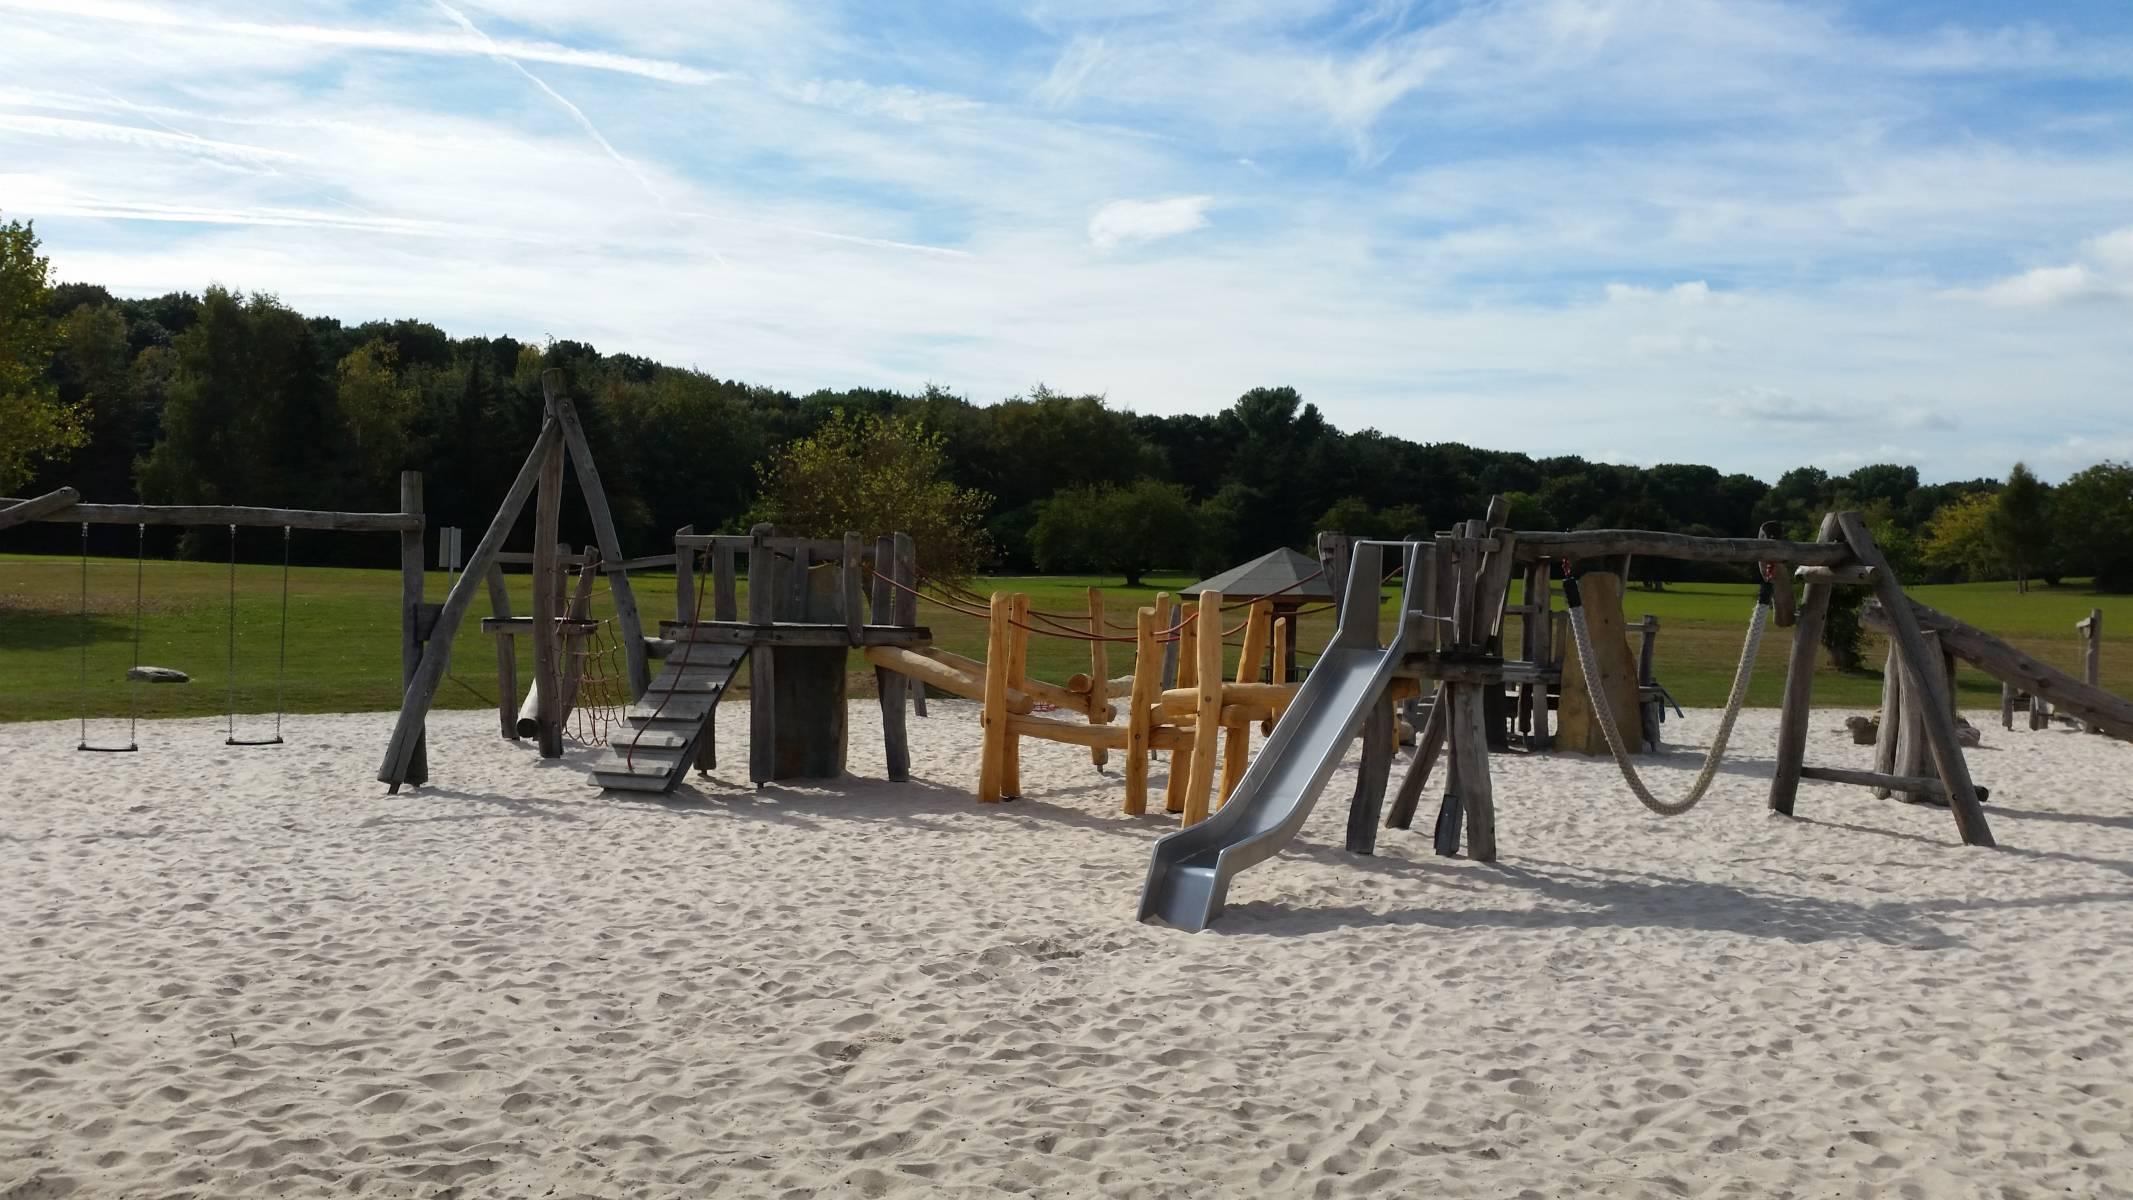 Neu Spielplatz Forstbotanischer Garten in Köln, Rodenkirchen  XL79